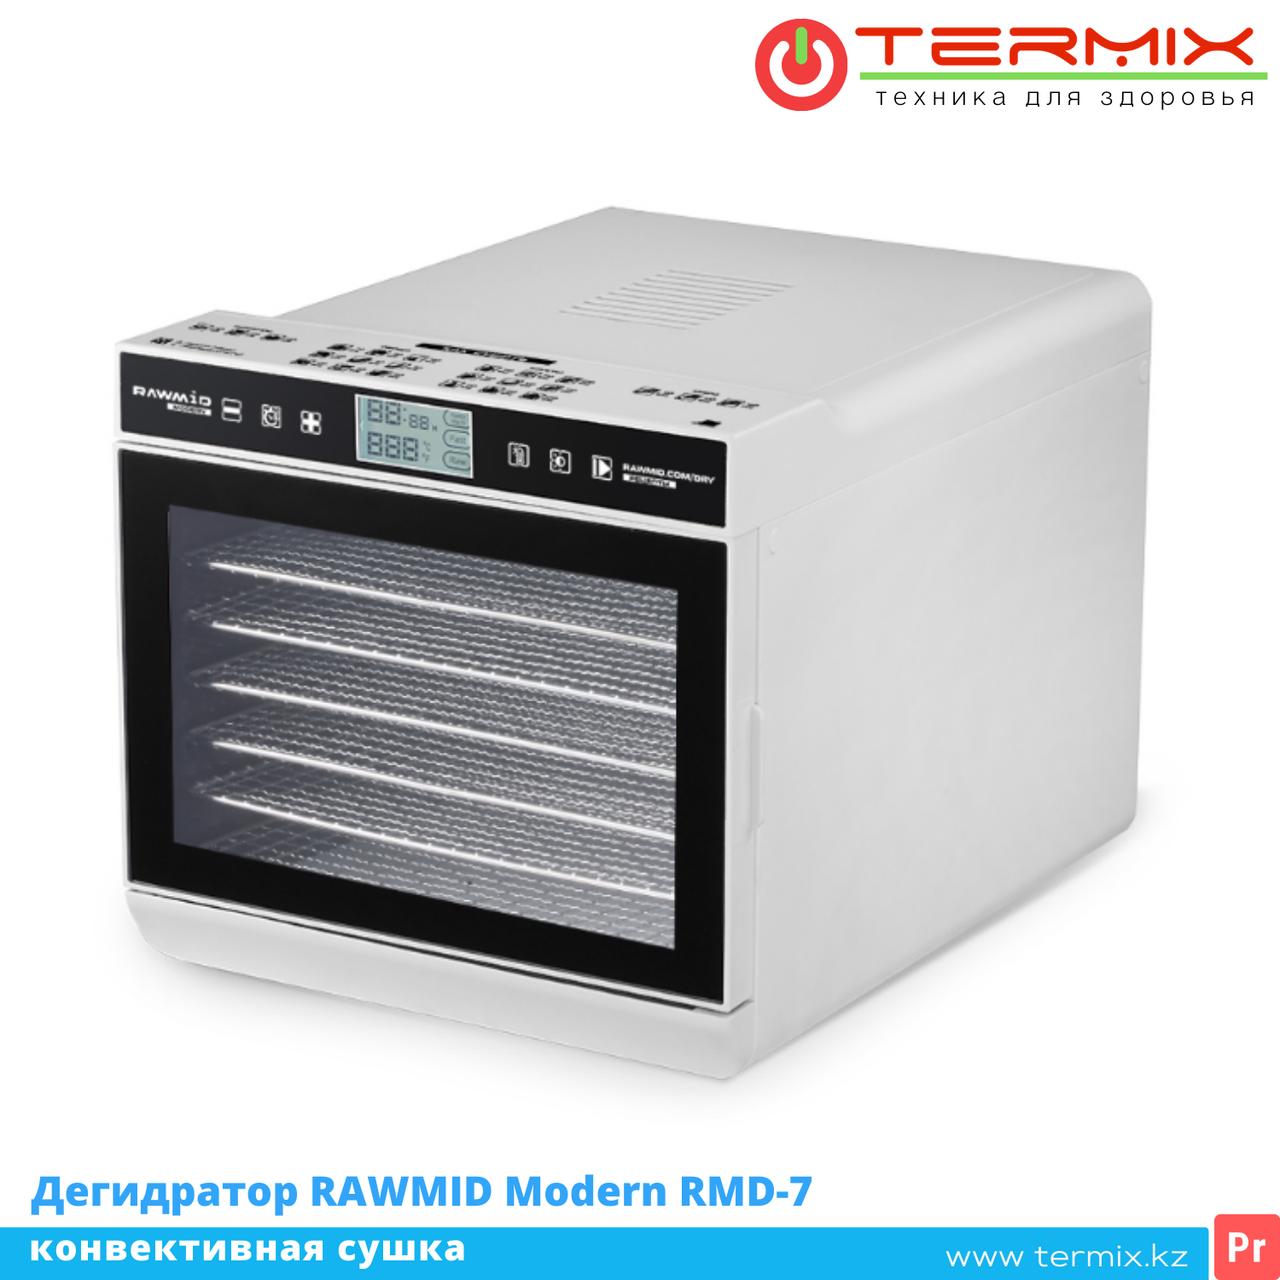 Дегидратор RAWMID Modern RMD-7. 6/6